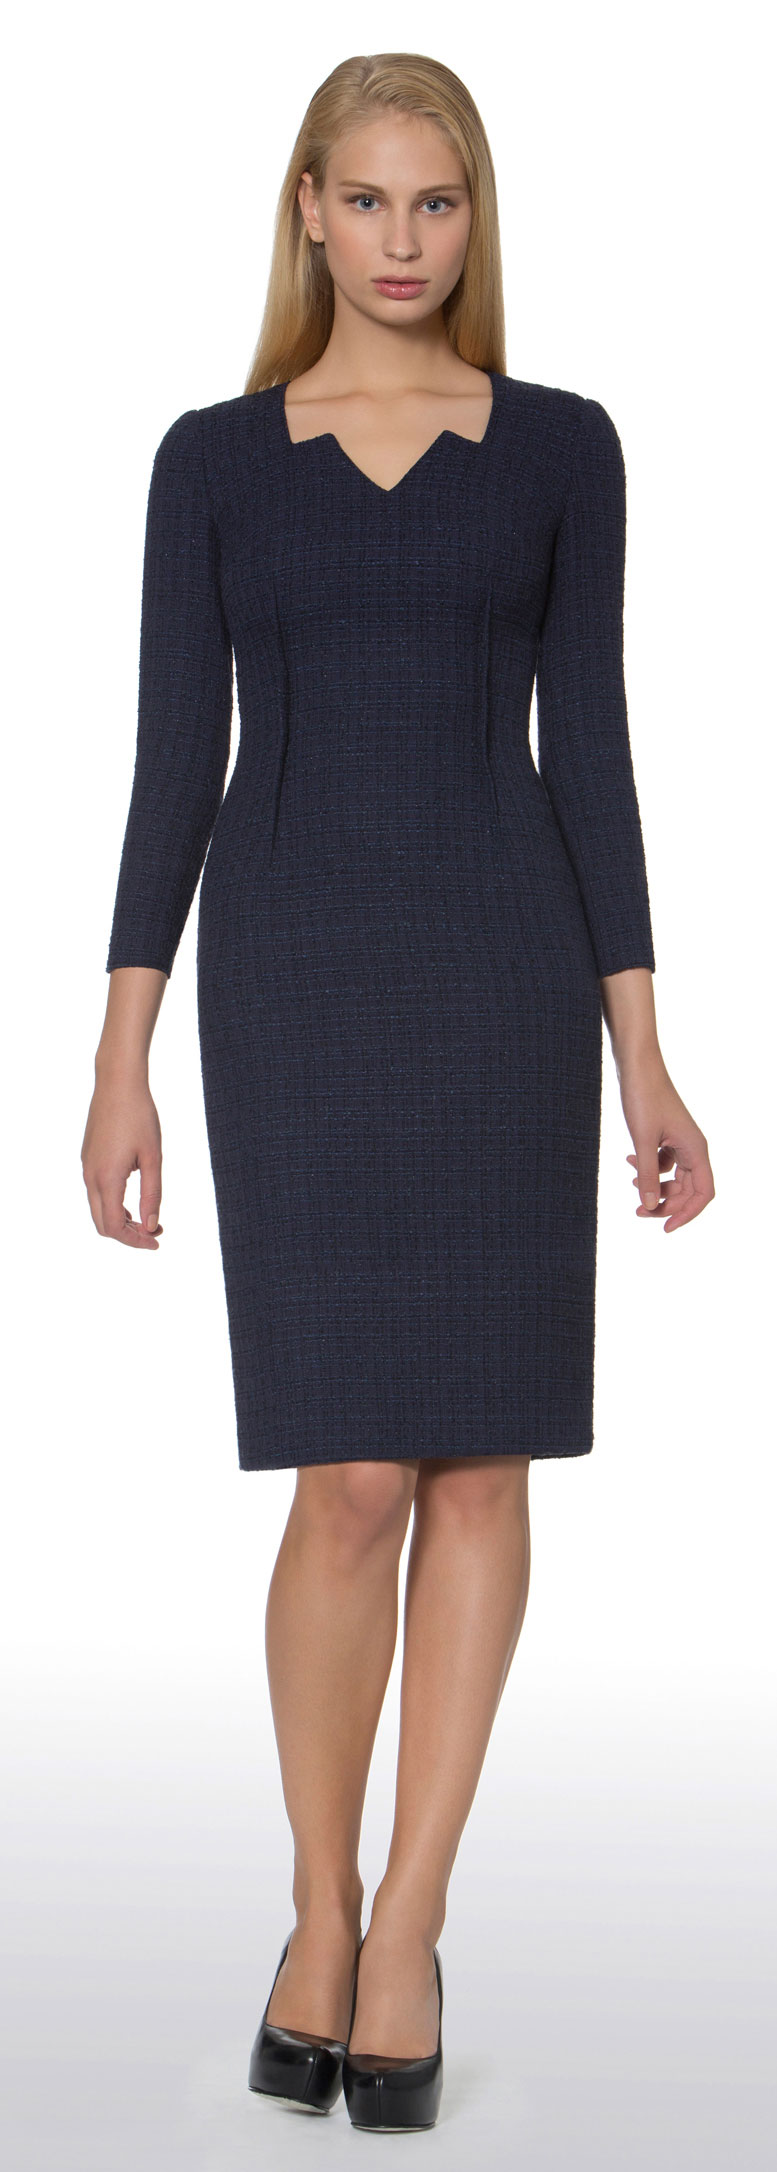 Z-Form-Uniform-Kelsy-Zimba-Dress-WD4-navy.jpg